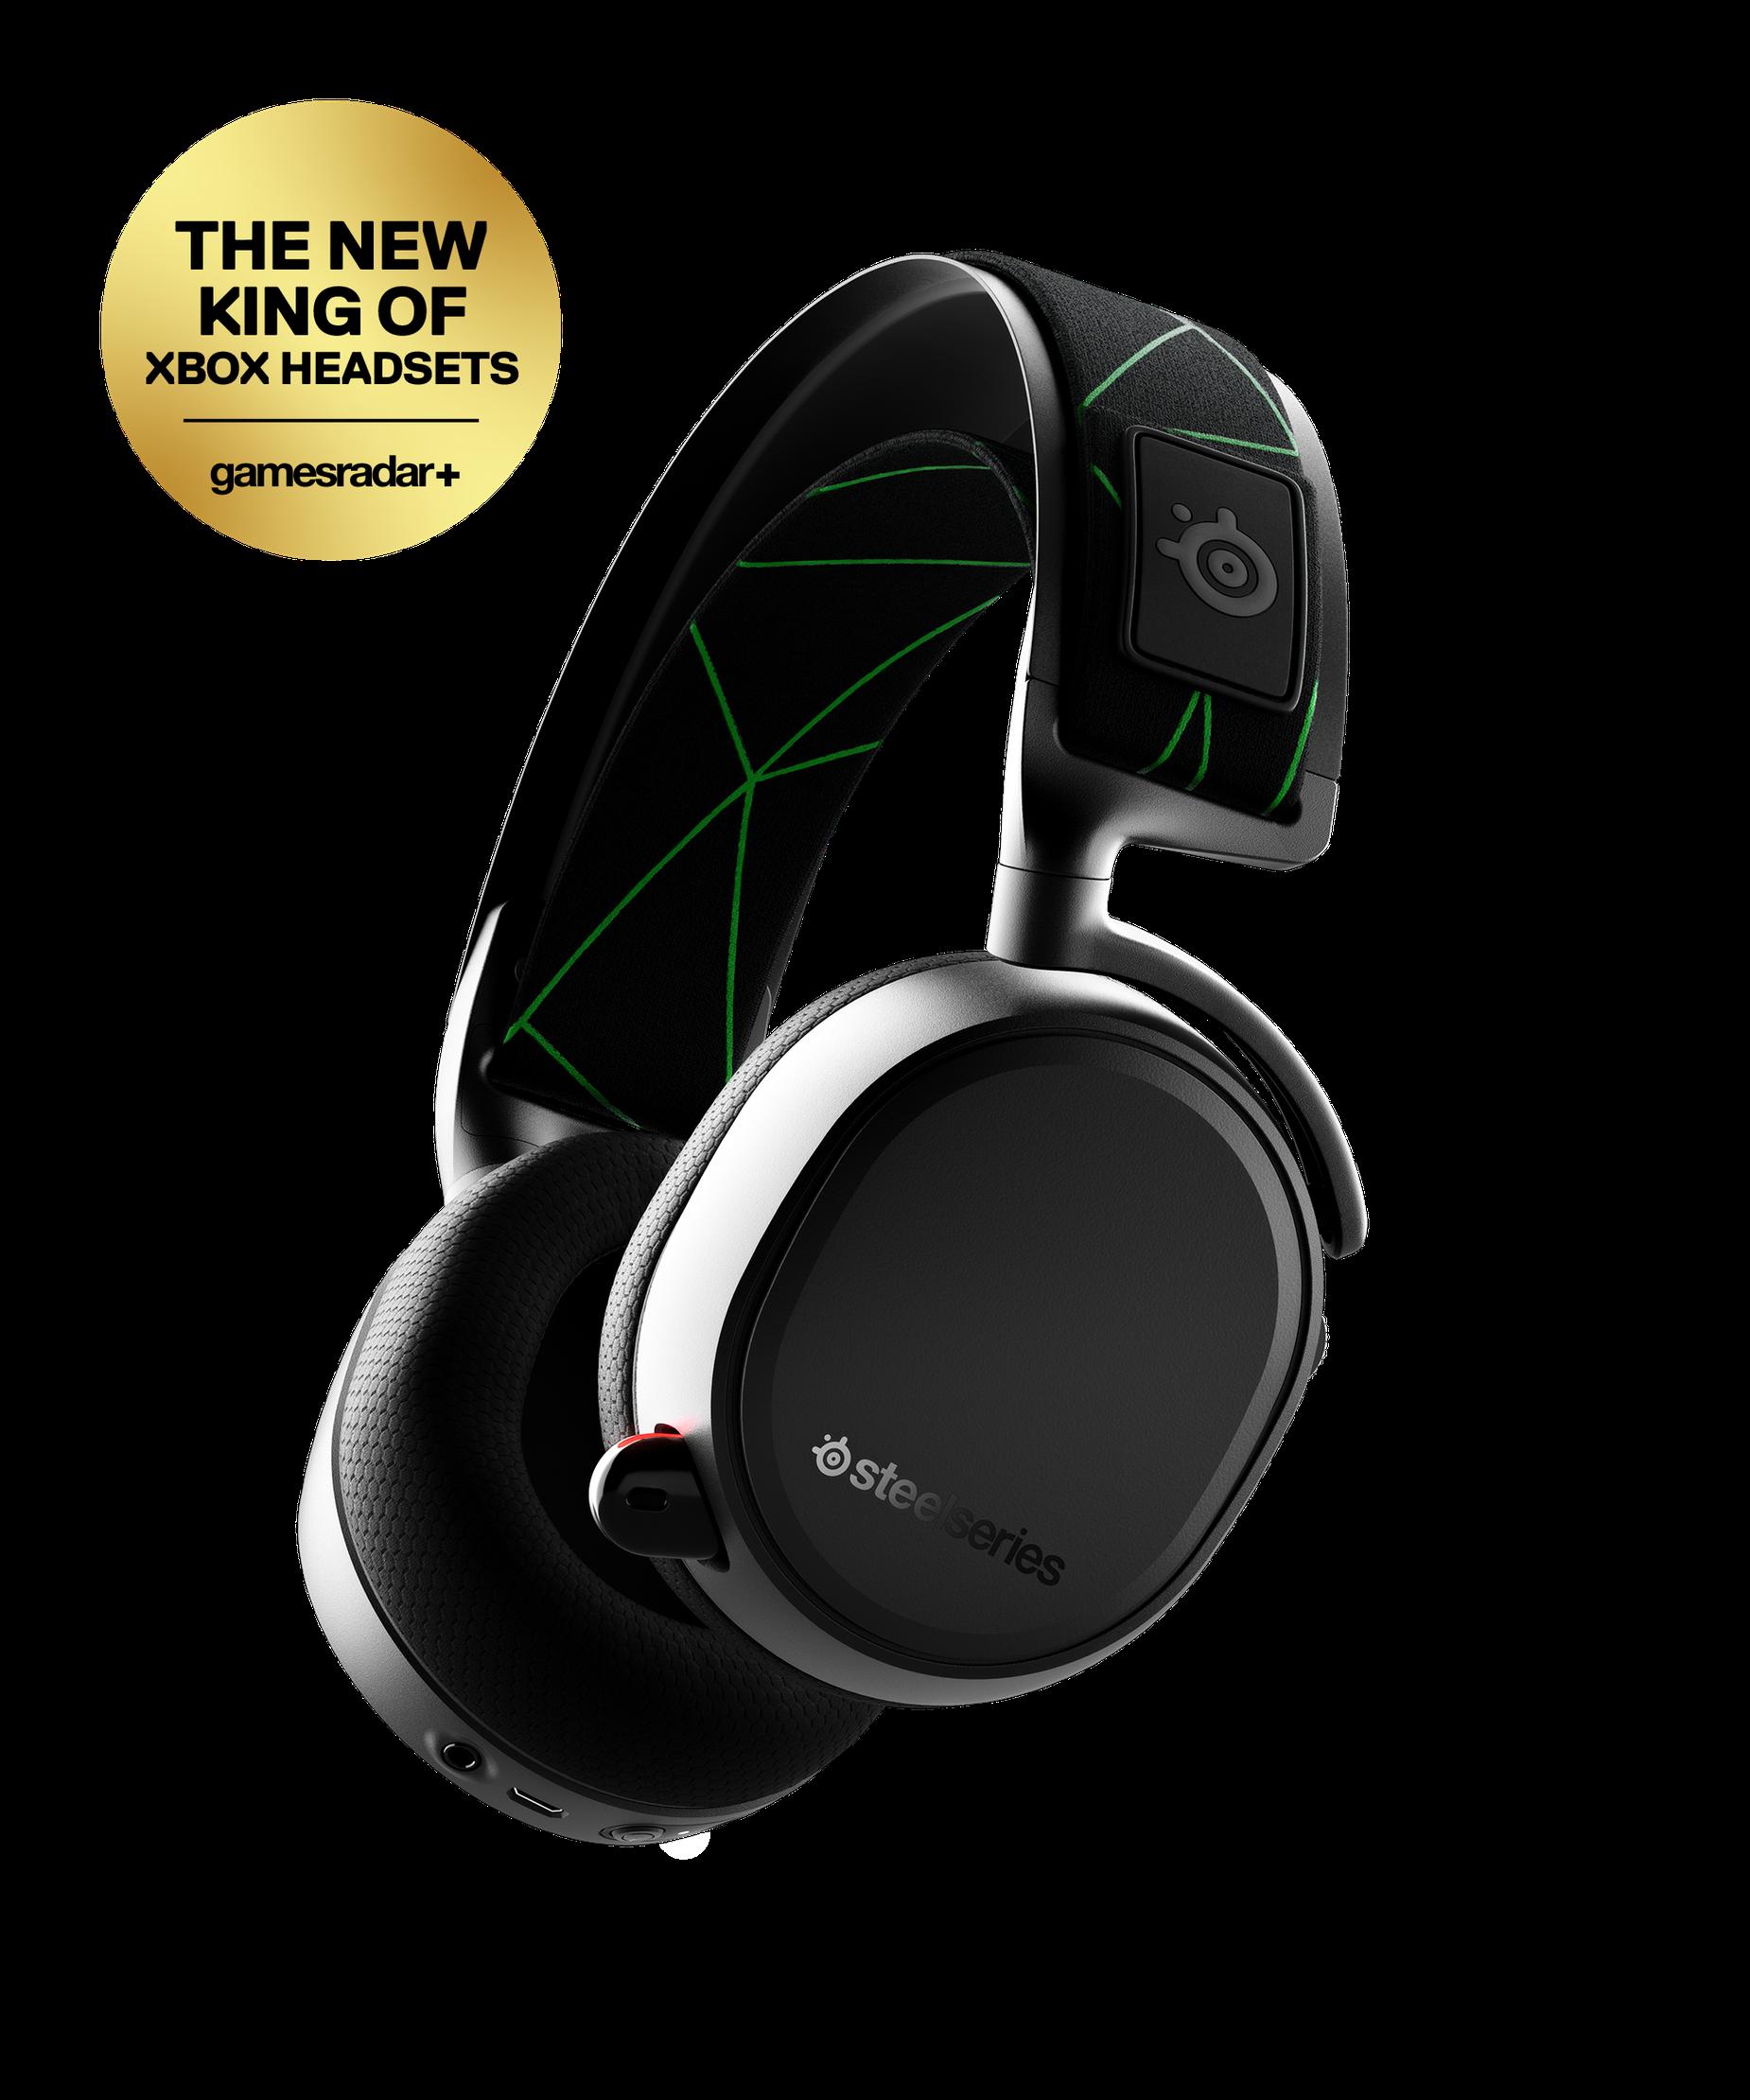 Arctis 9X 輪廓角度檢視圖,獲得 Xbox Headsets gamesradar+ 標章